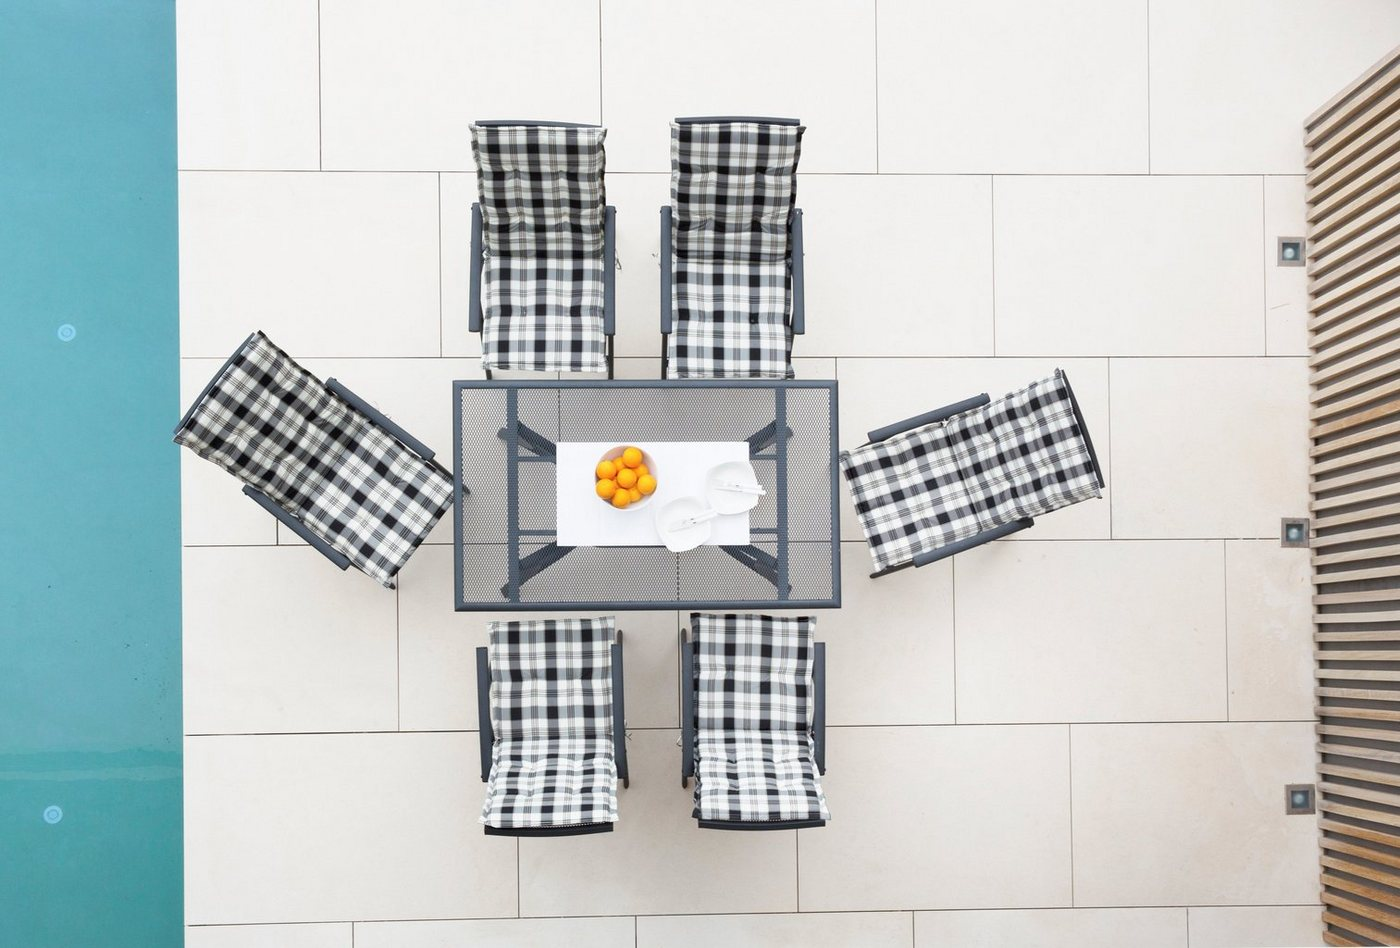 Tuinmeubelset Montreal, 6 klapstoelen, tafel 150x90 cm, aluminium, antraciet